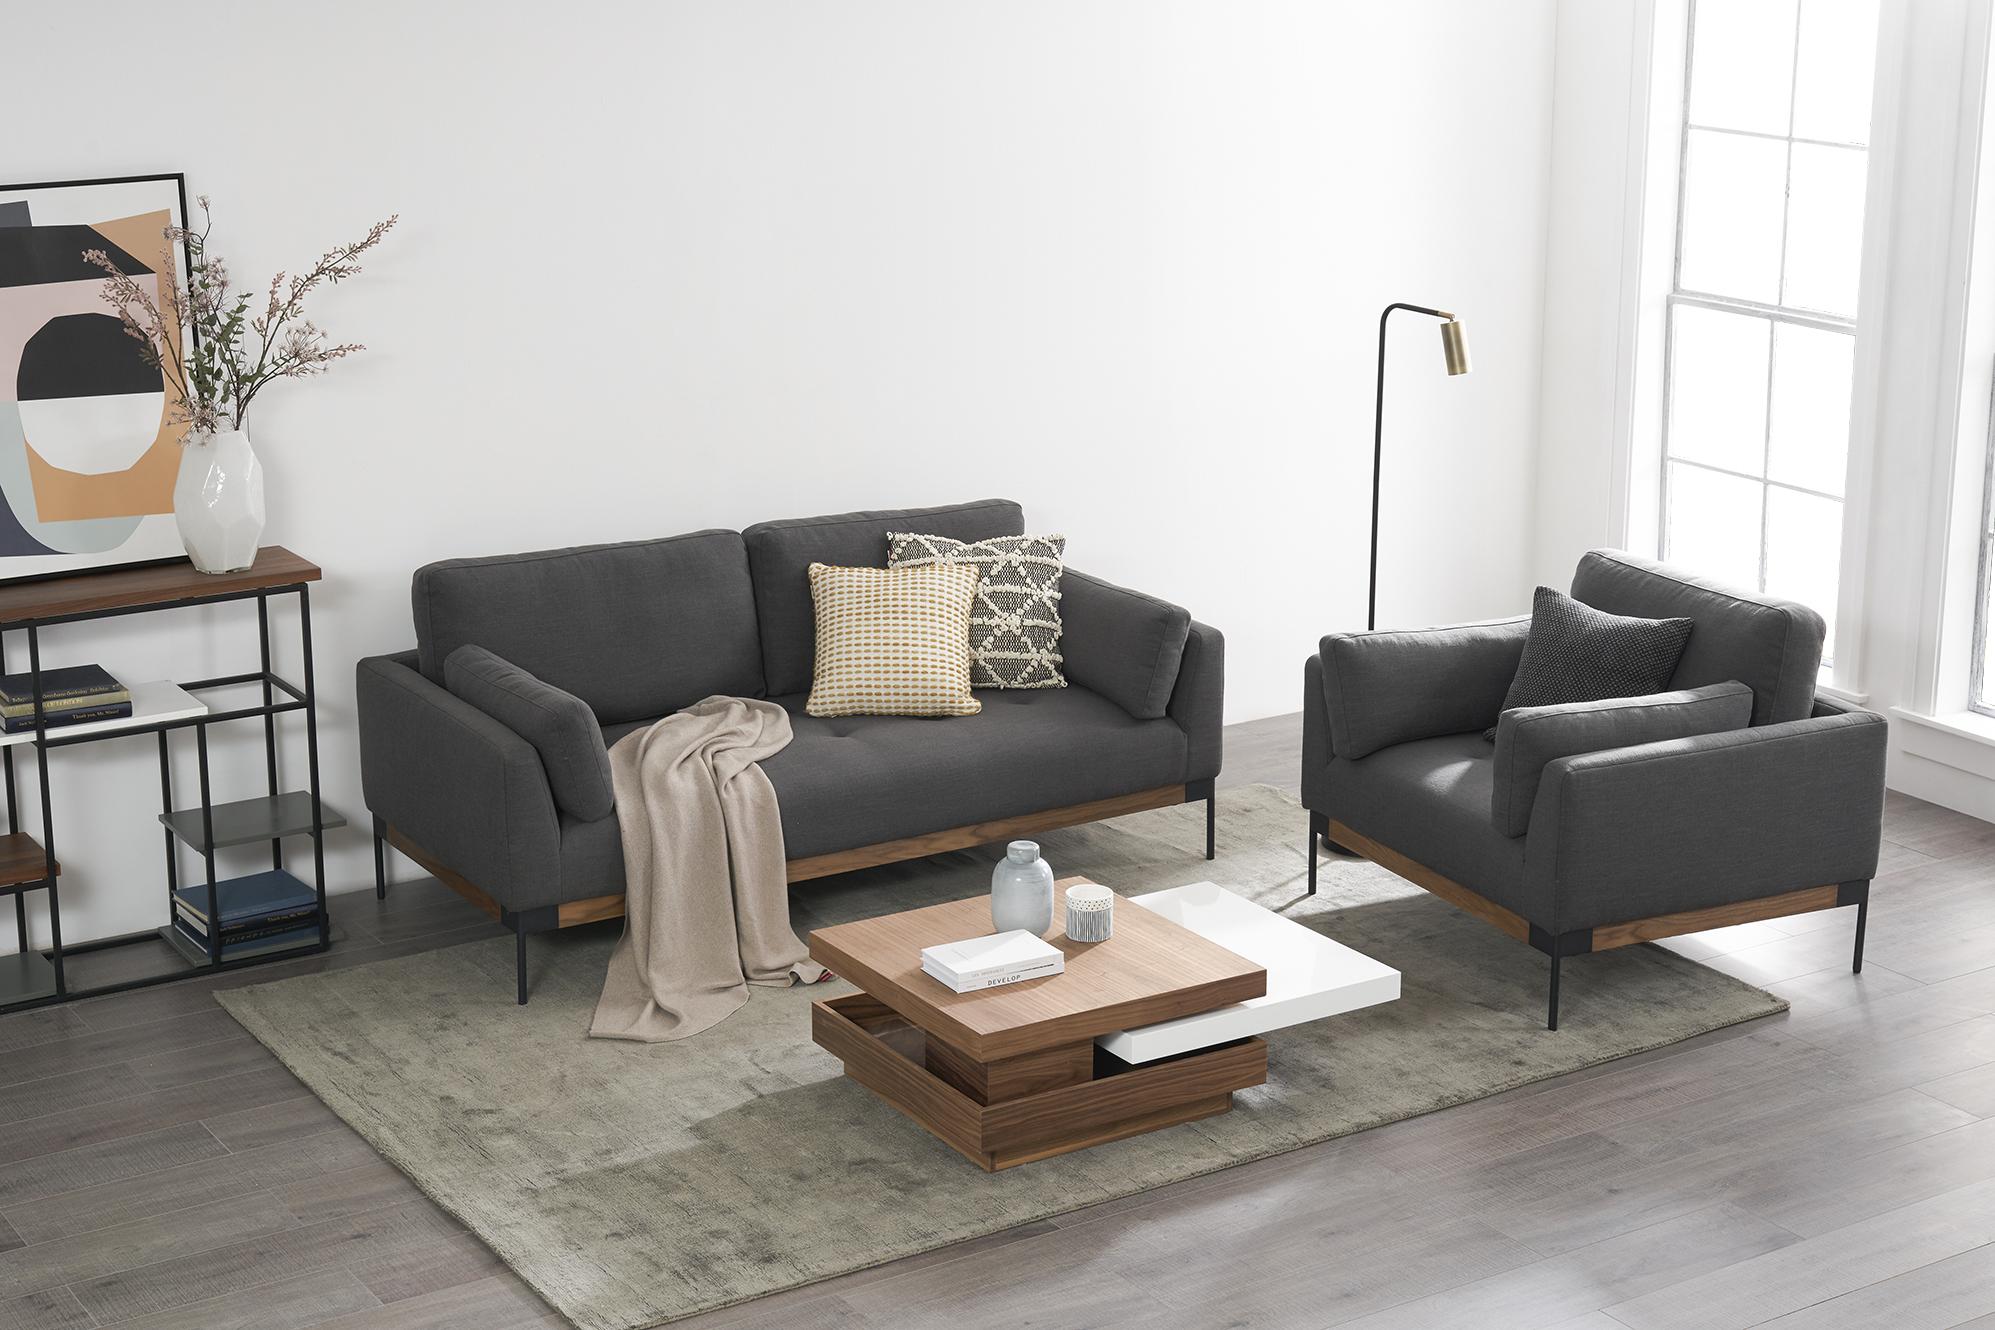 Ethan 3 seater sofa and Ethan armchair